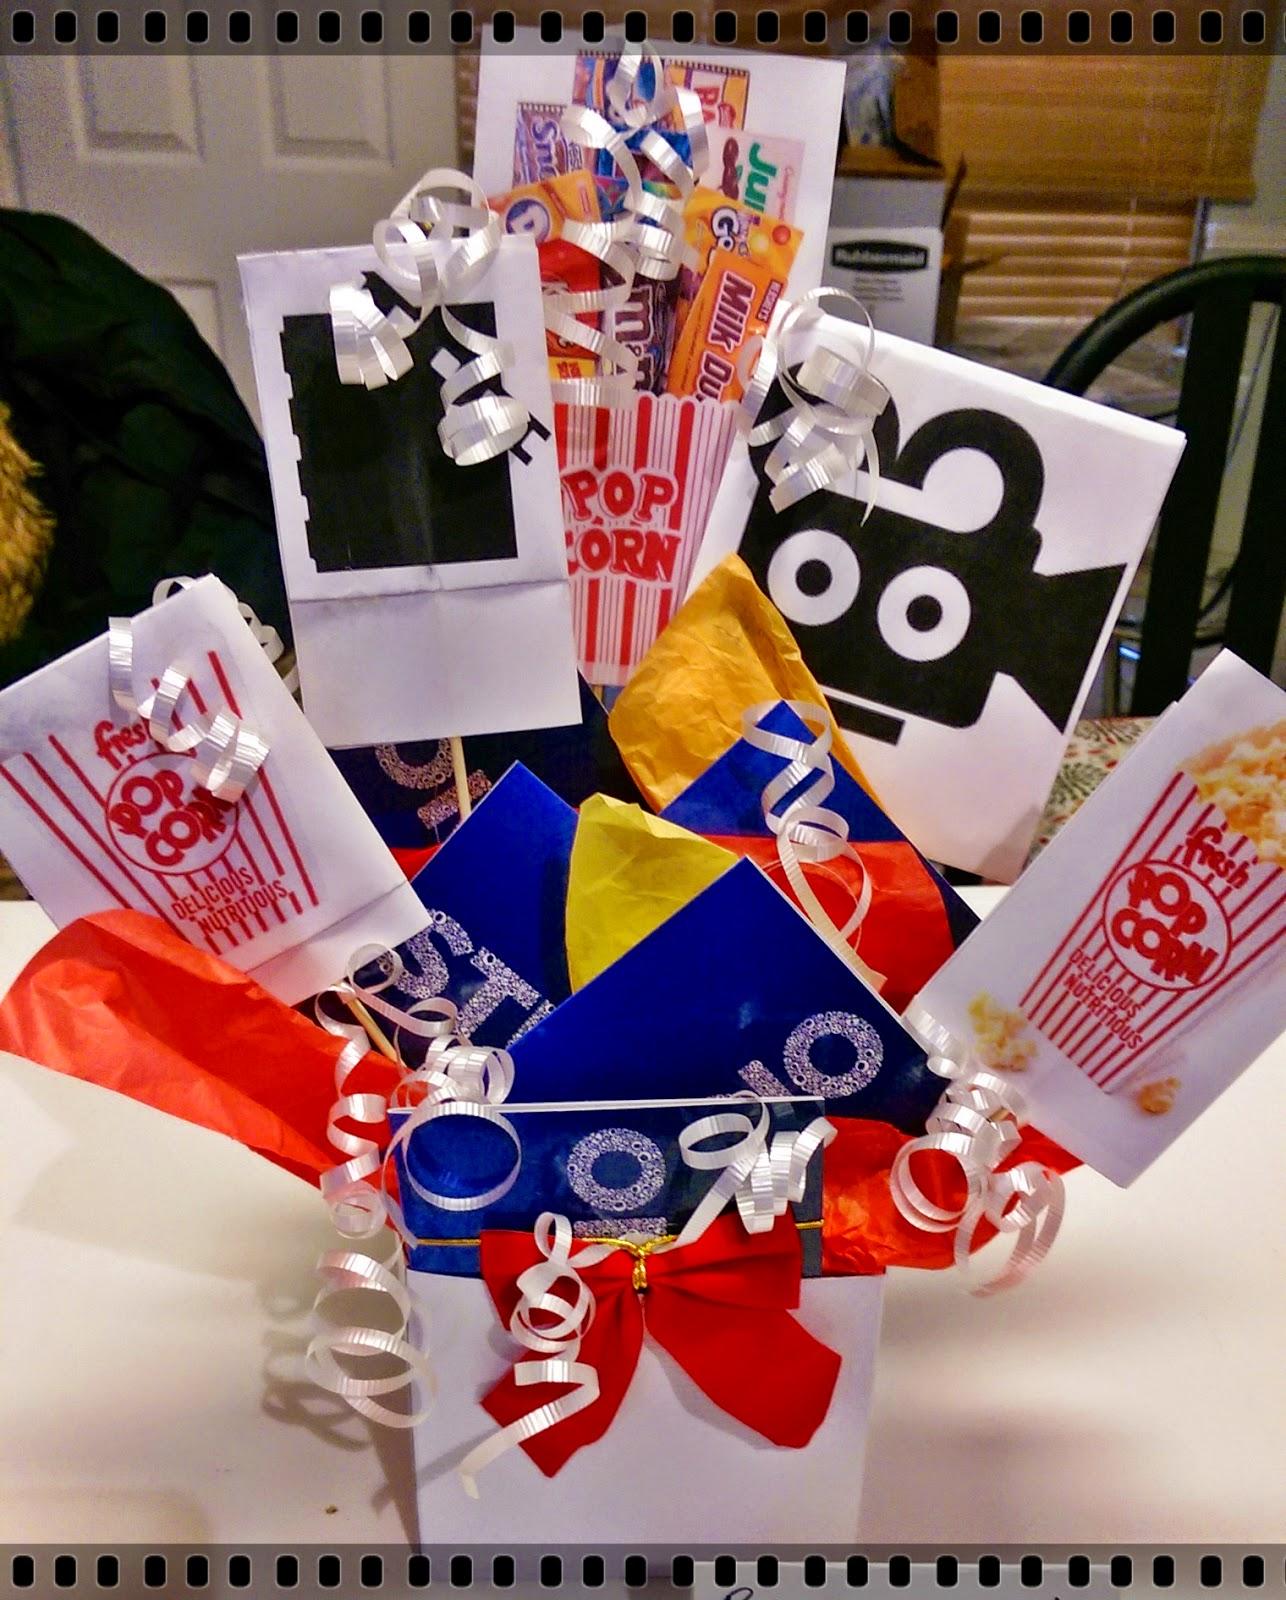 Meg made creations gift card bouquet diy gift idea for guys gift card bouquet diy negle Gallery